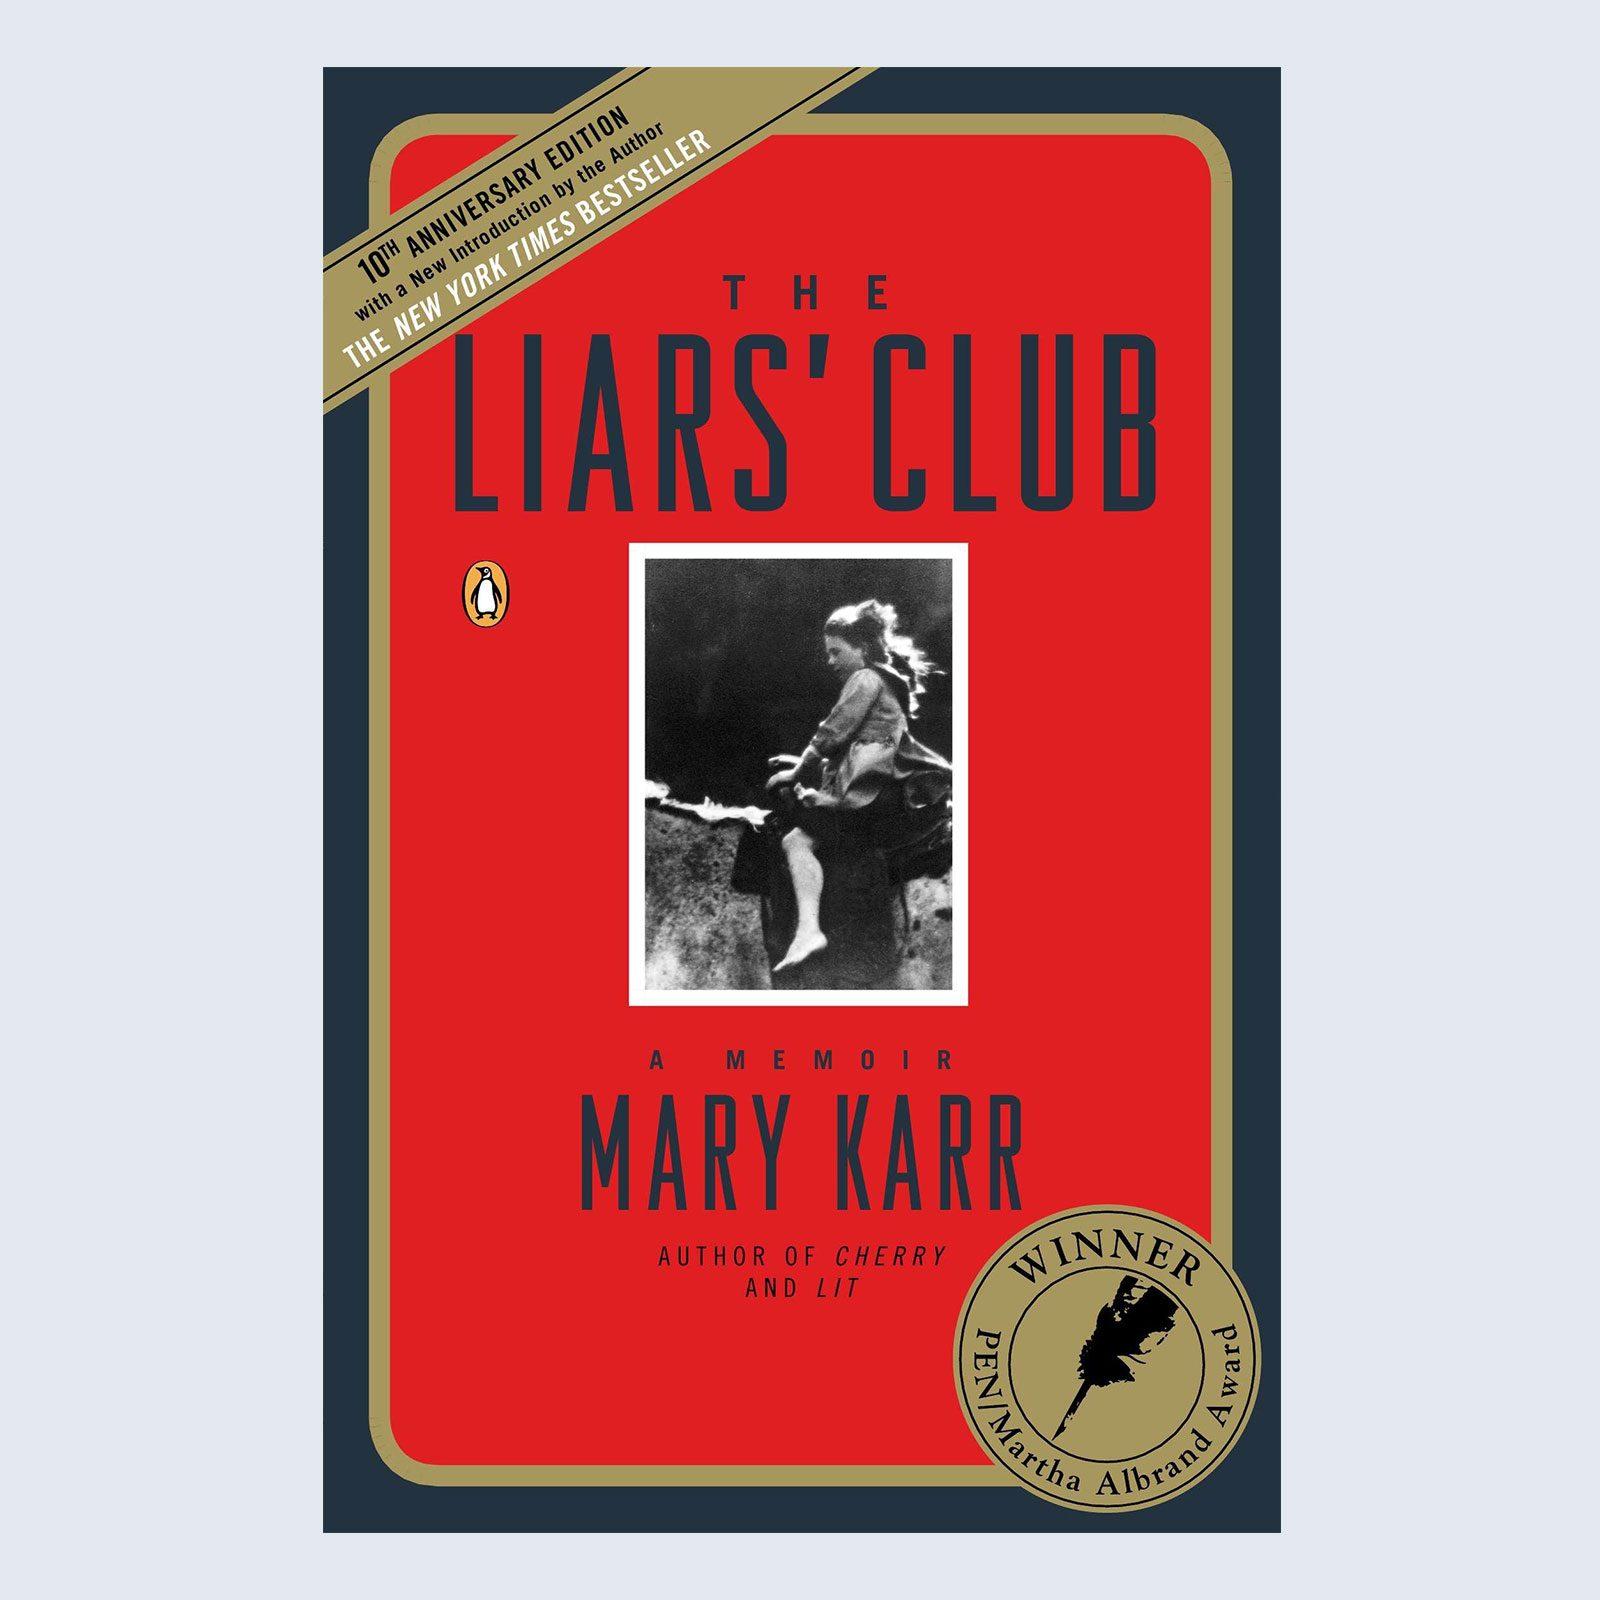 The Liar's Club by Mary Karr